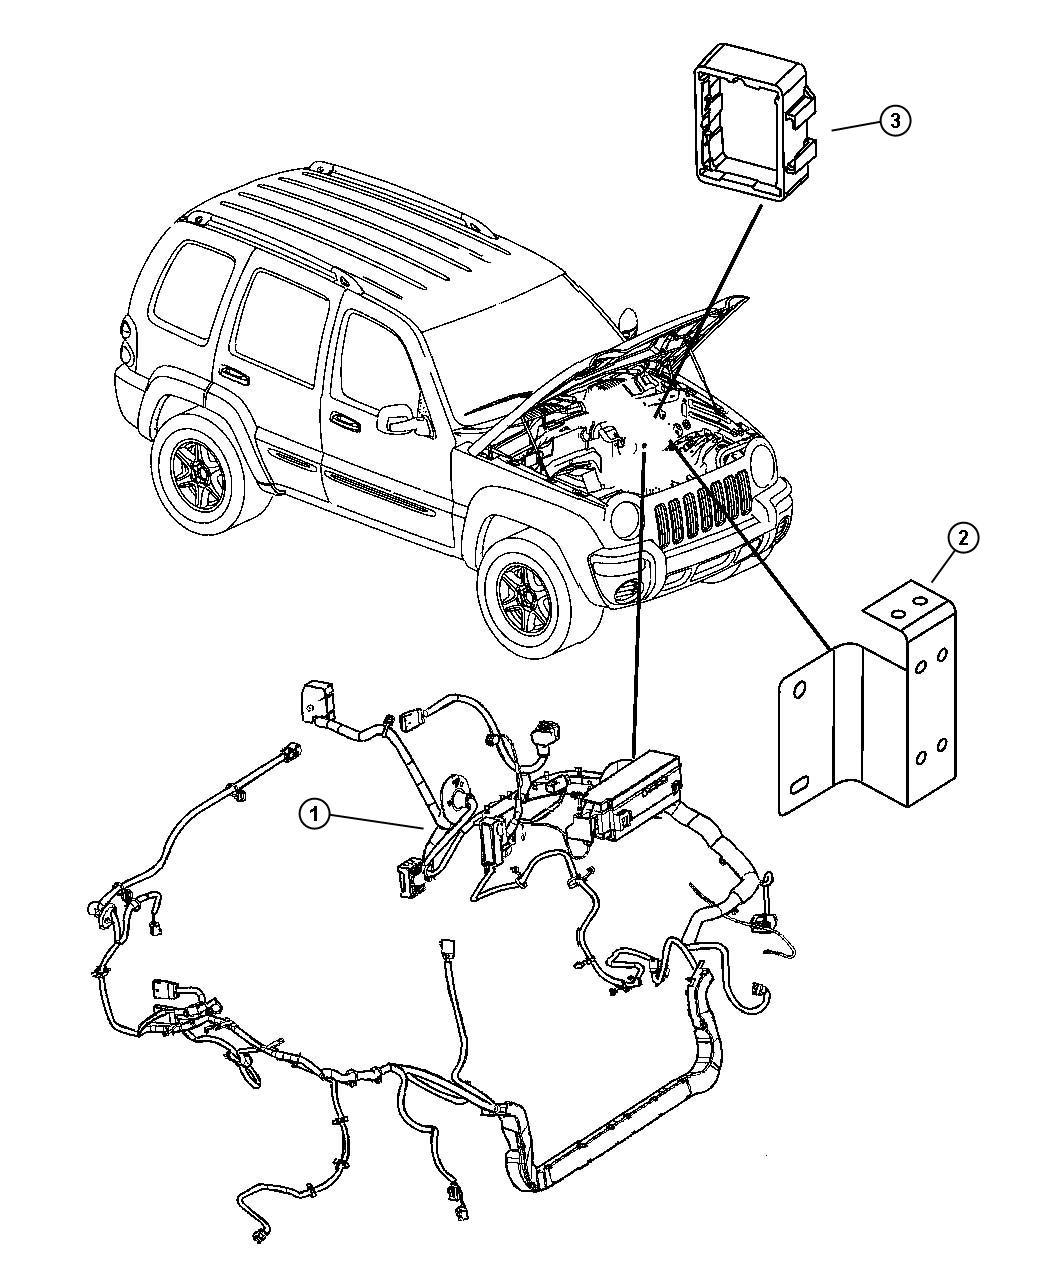 56047664ad jeep wiring headlamp to dash alarmtire. Black Bedroom Furniture Sets. Home Design Ideas